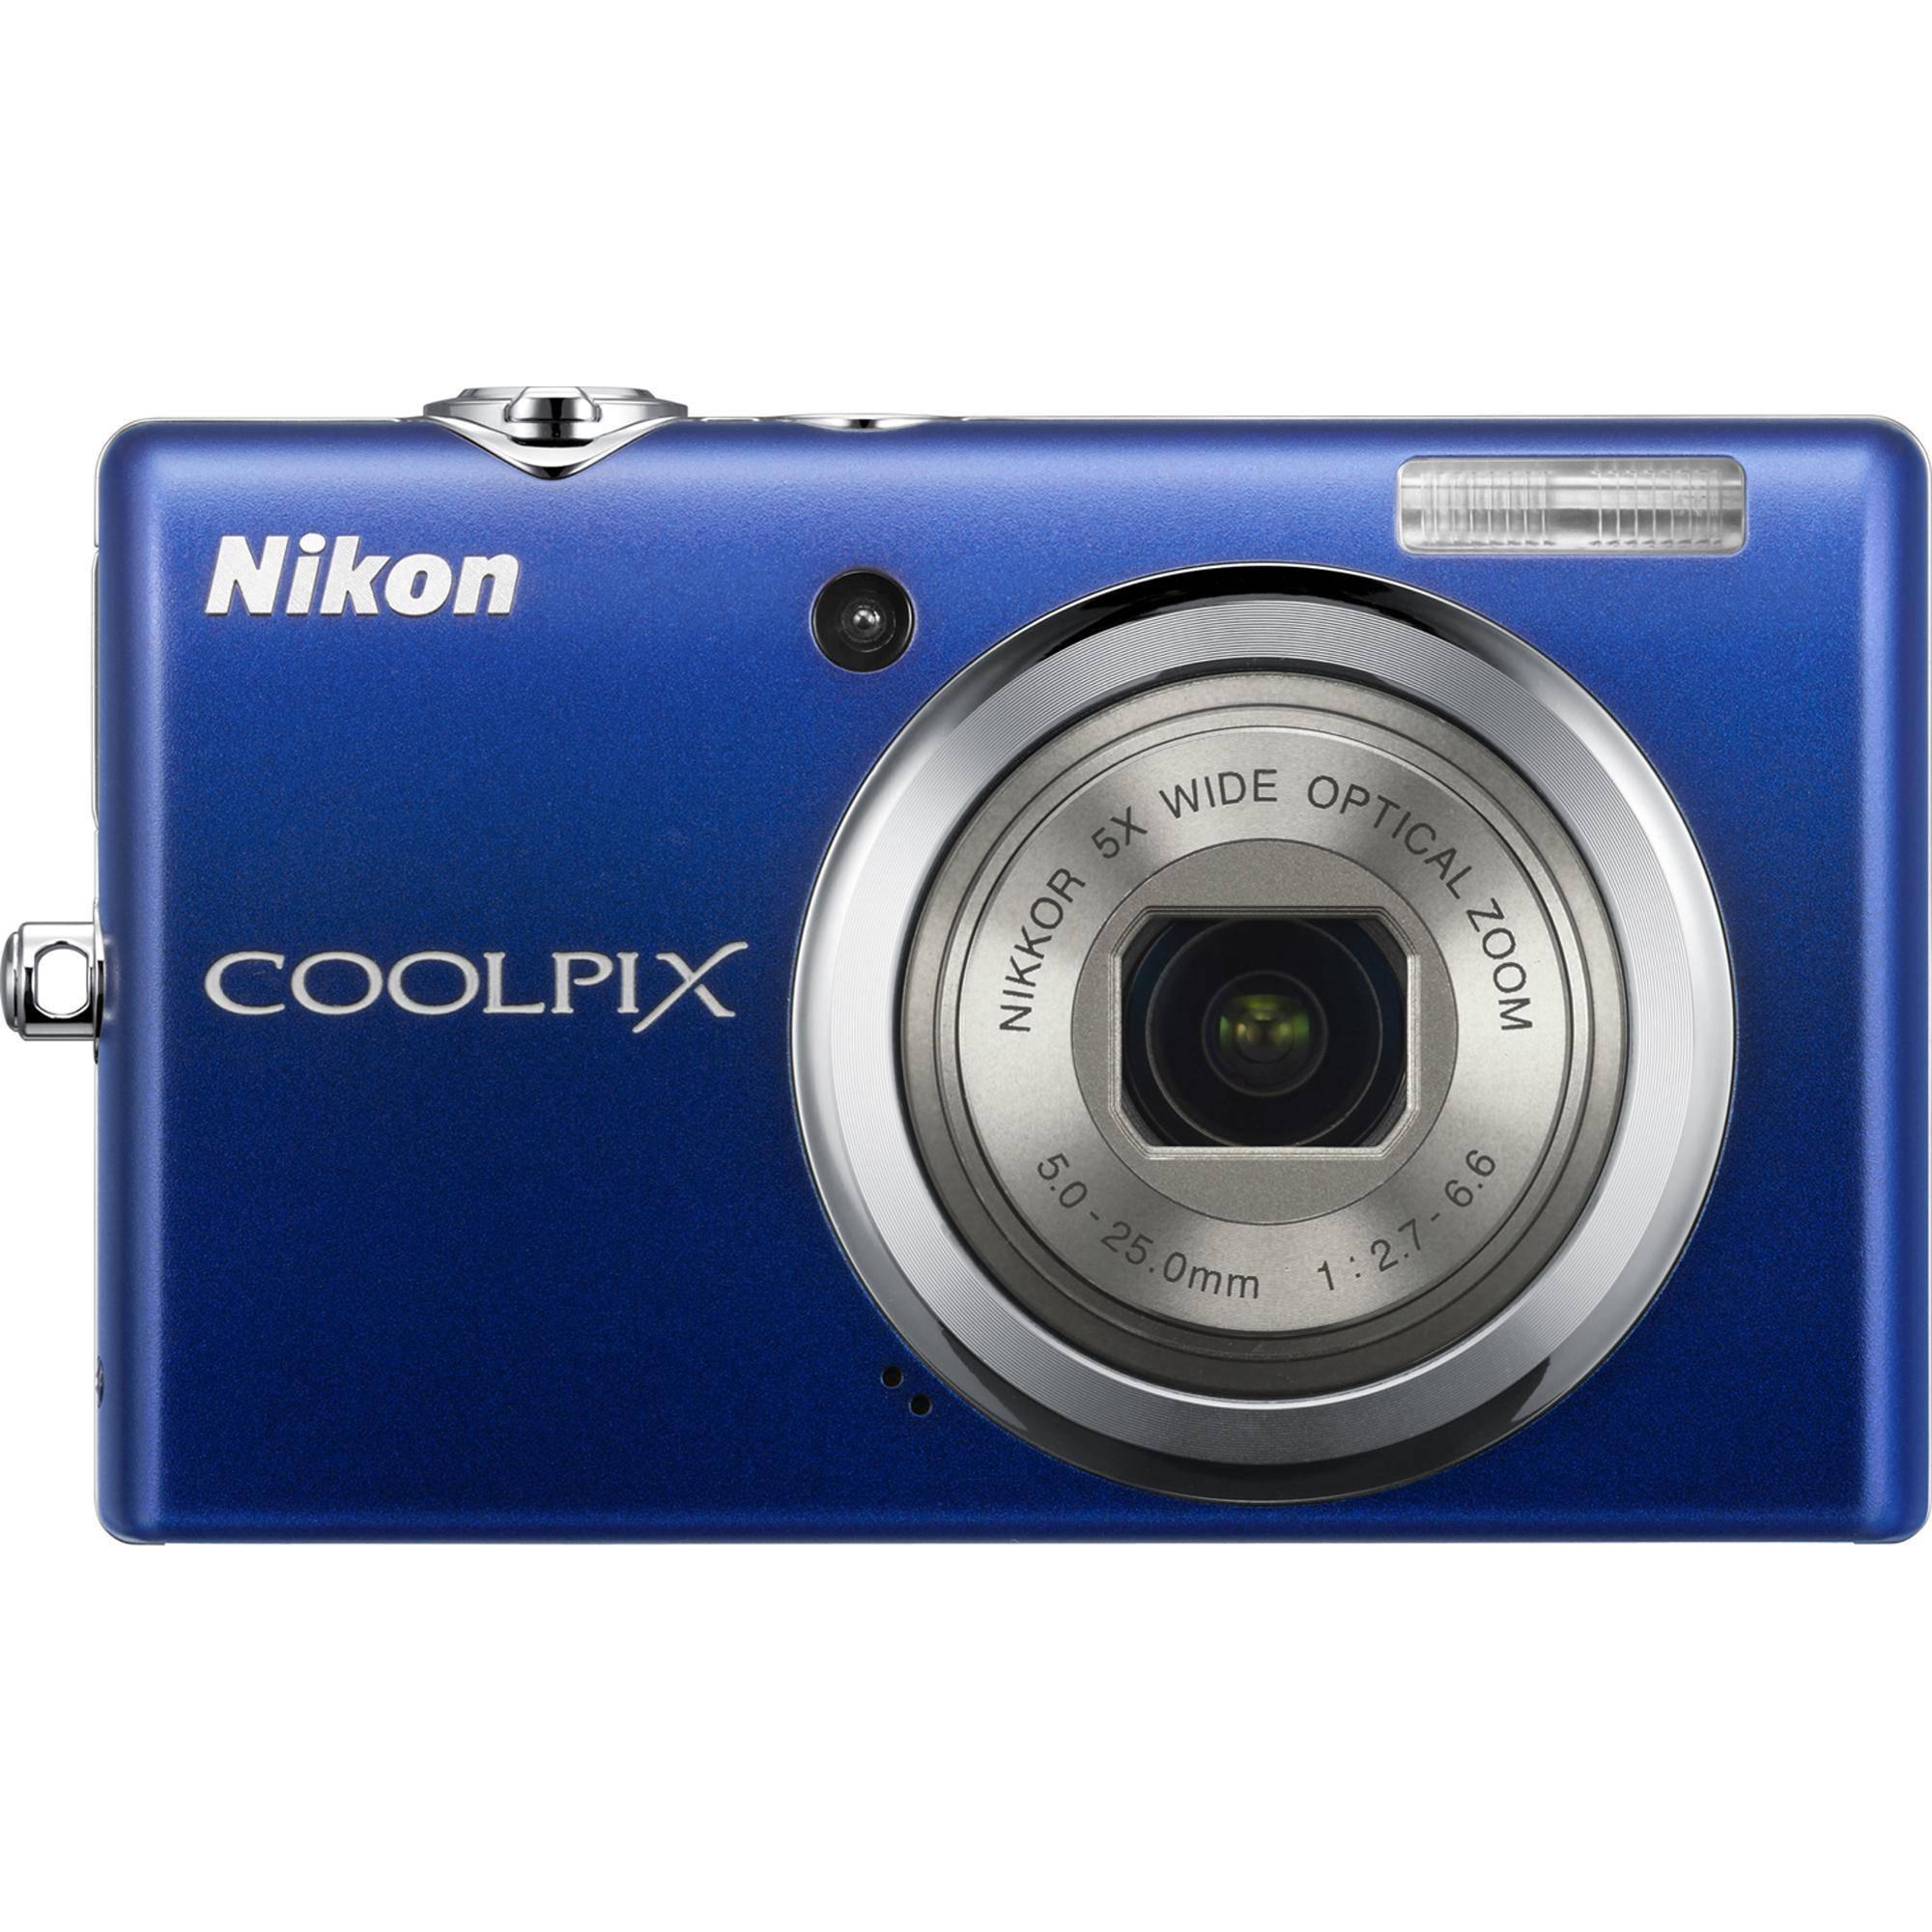 nikon coolpix s570 digital camera blue 26179 b h photo video rh bhphotovideo com nikon coolpix s560 user manual nikon coolpix s560 user manual